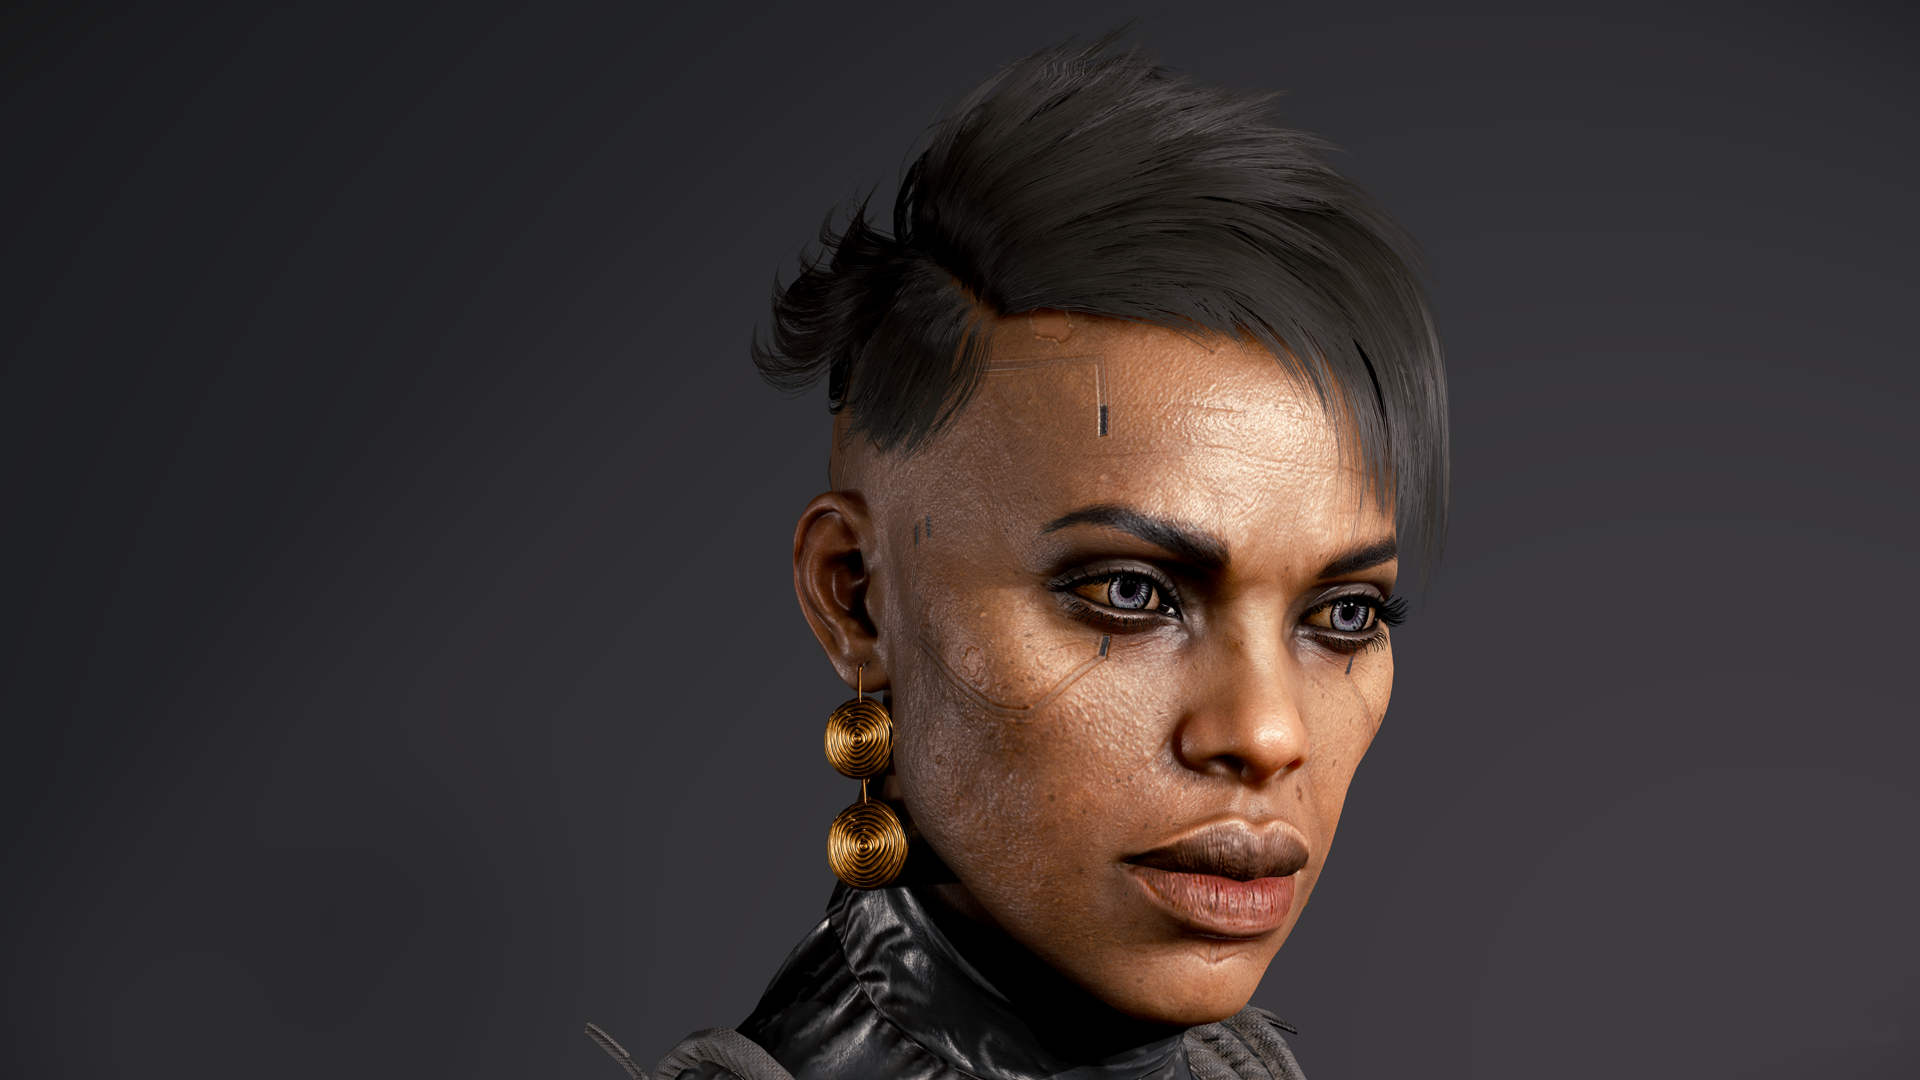 CDPR放出一批《赛博朋克2077》角色高清模型图